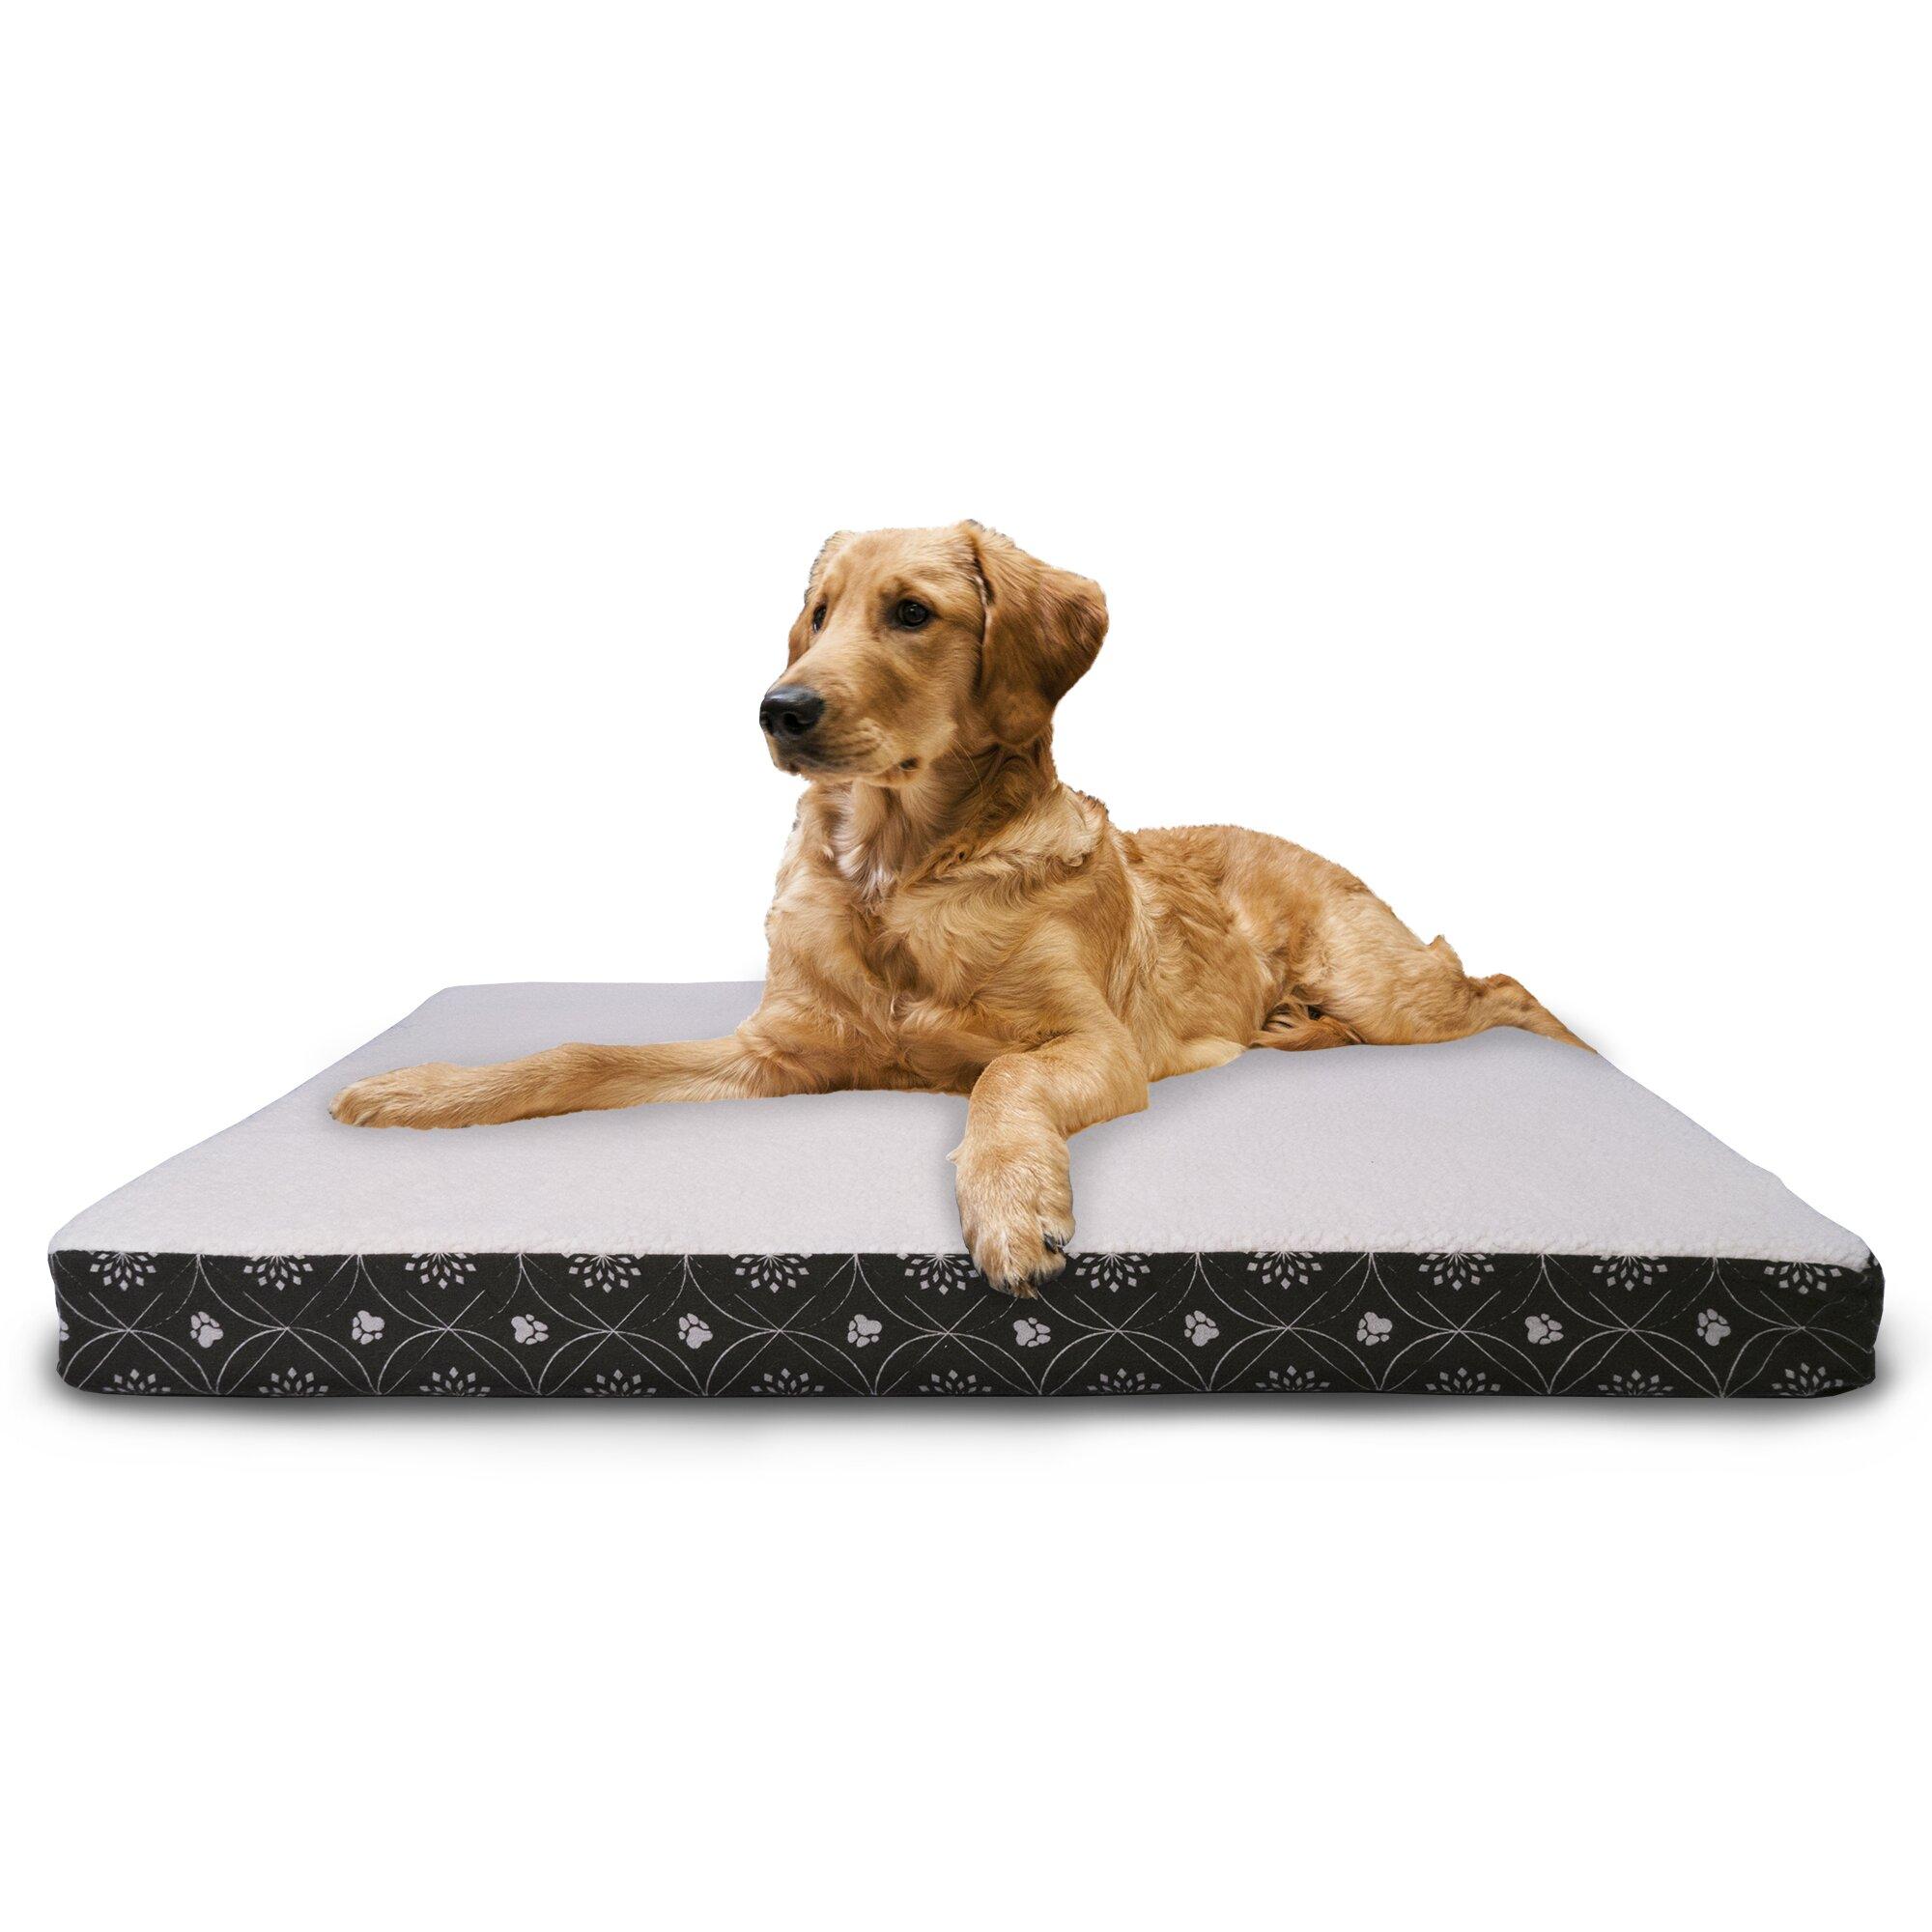 Orthopedic Egg Crate Dog Bed